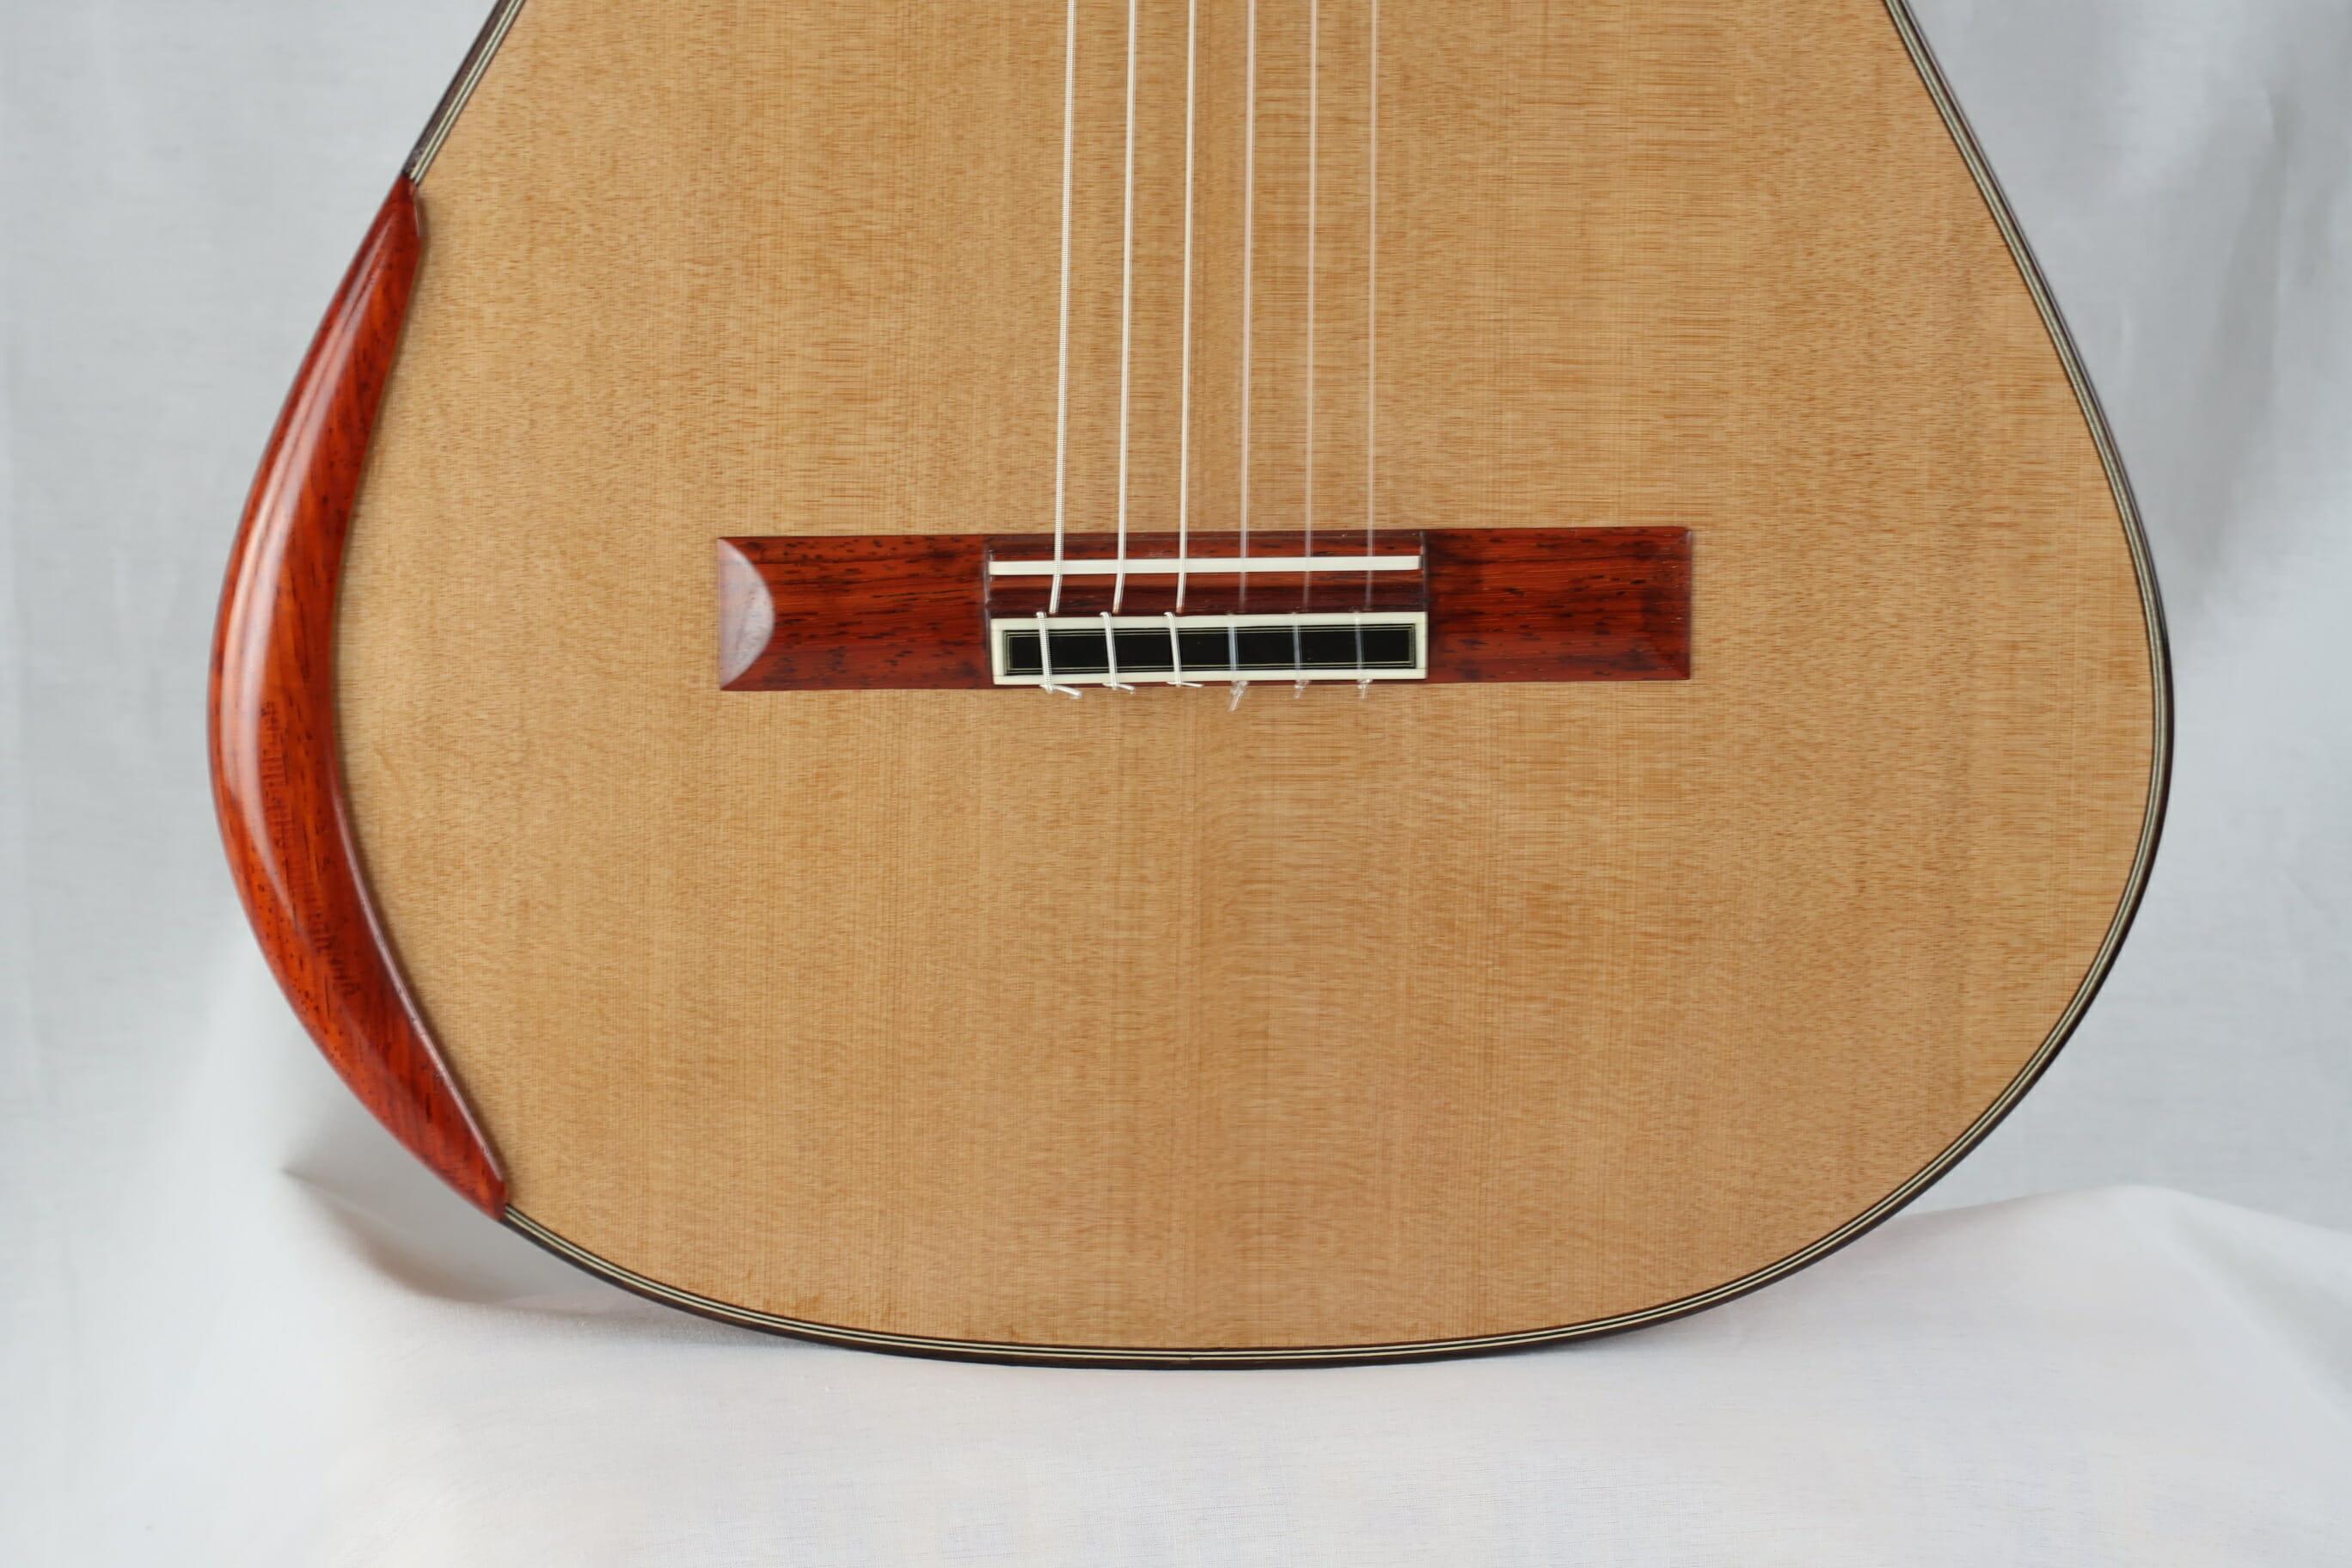 Guitare classique luthier Charalampos Koumridis barrage lattice No 124 19KOU124-08